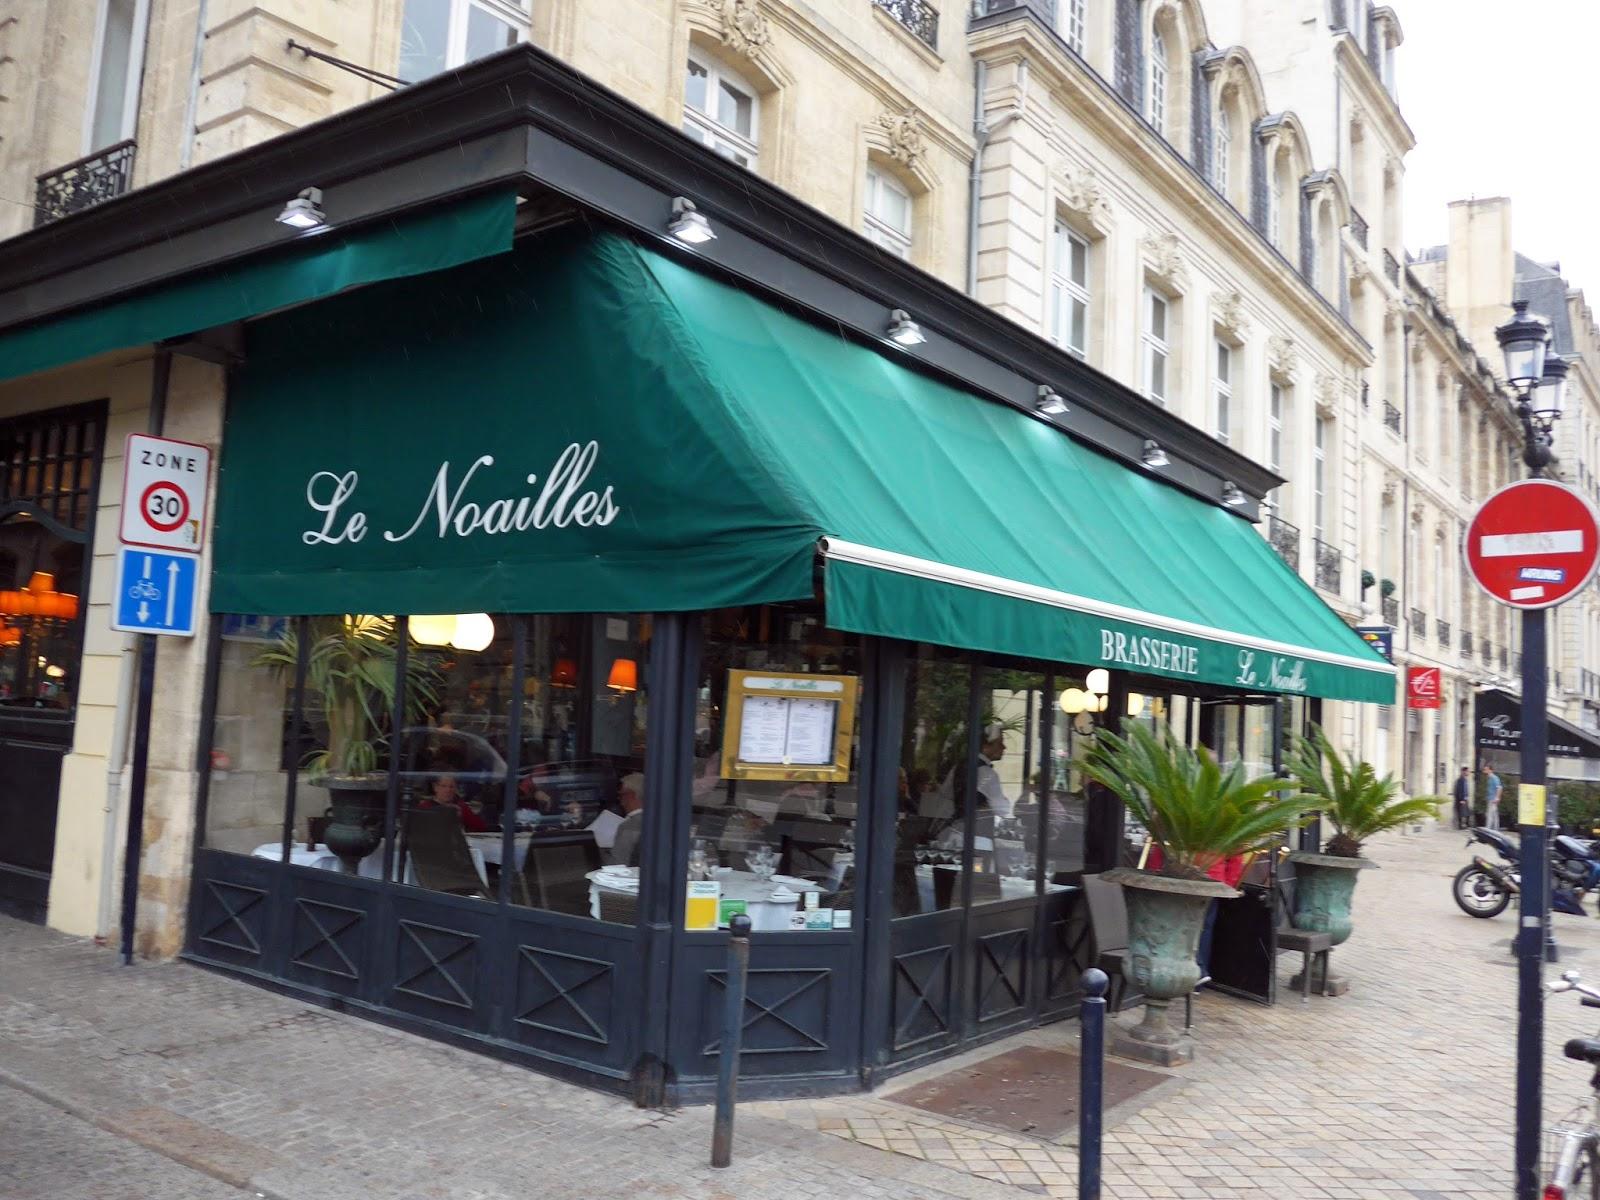 Le Noailles: Classy Brasserie in Bordeaux, France | Tasting Bites